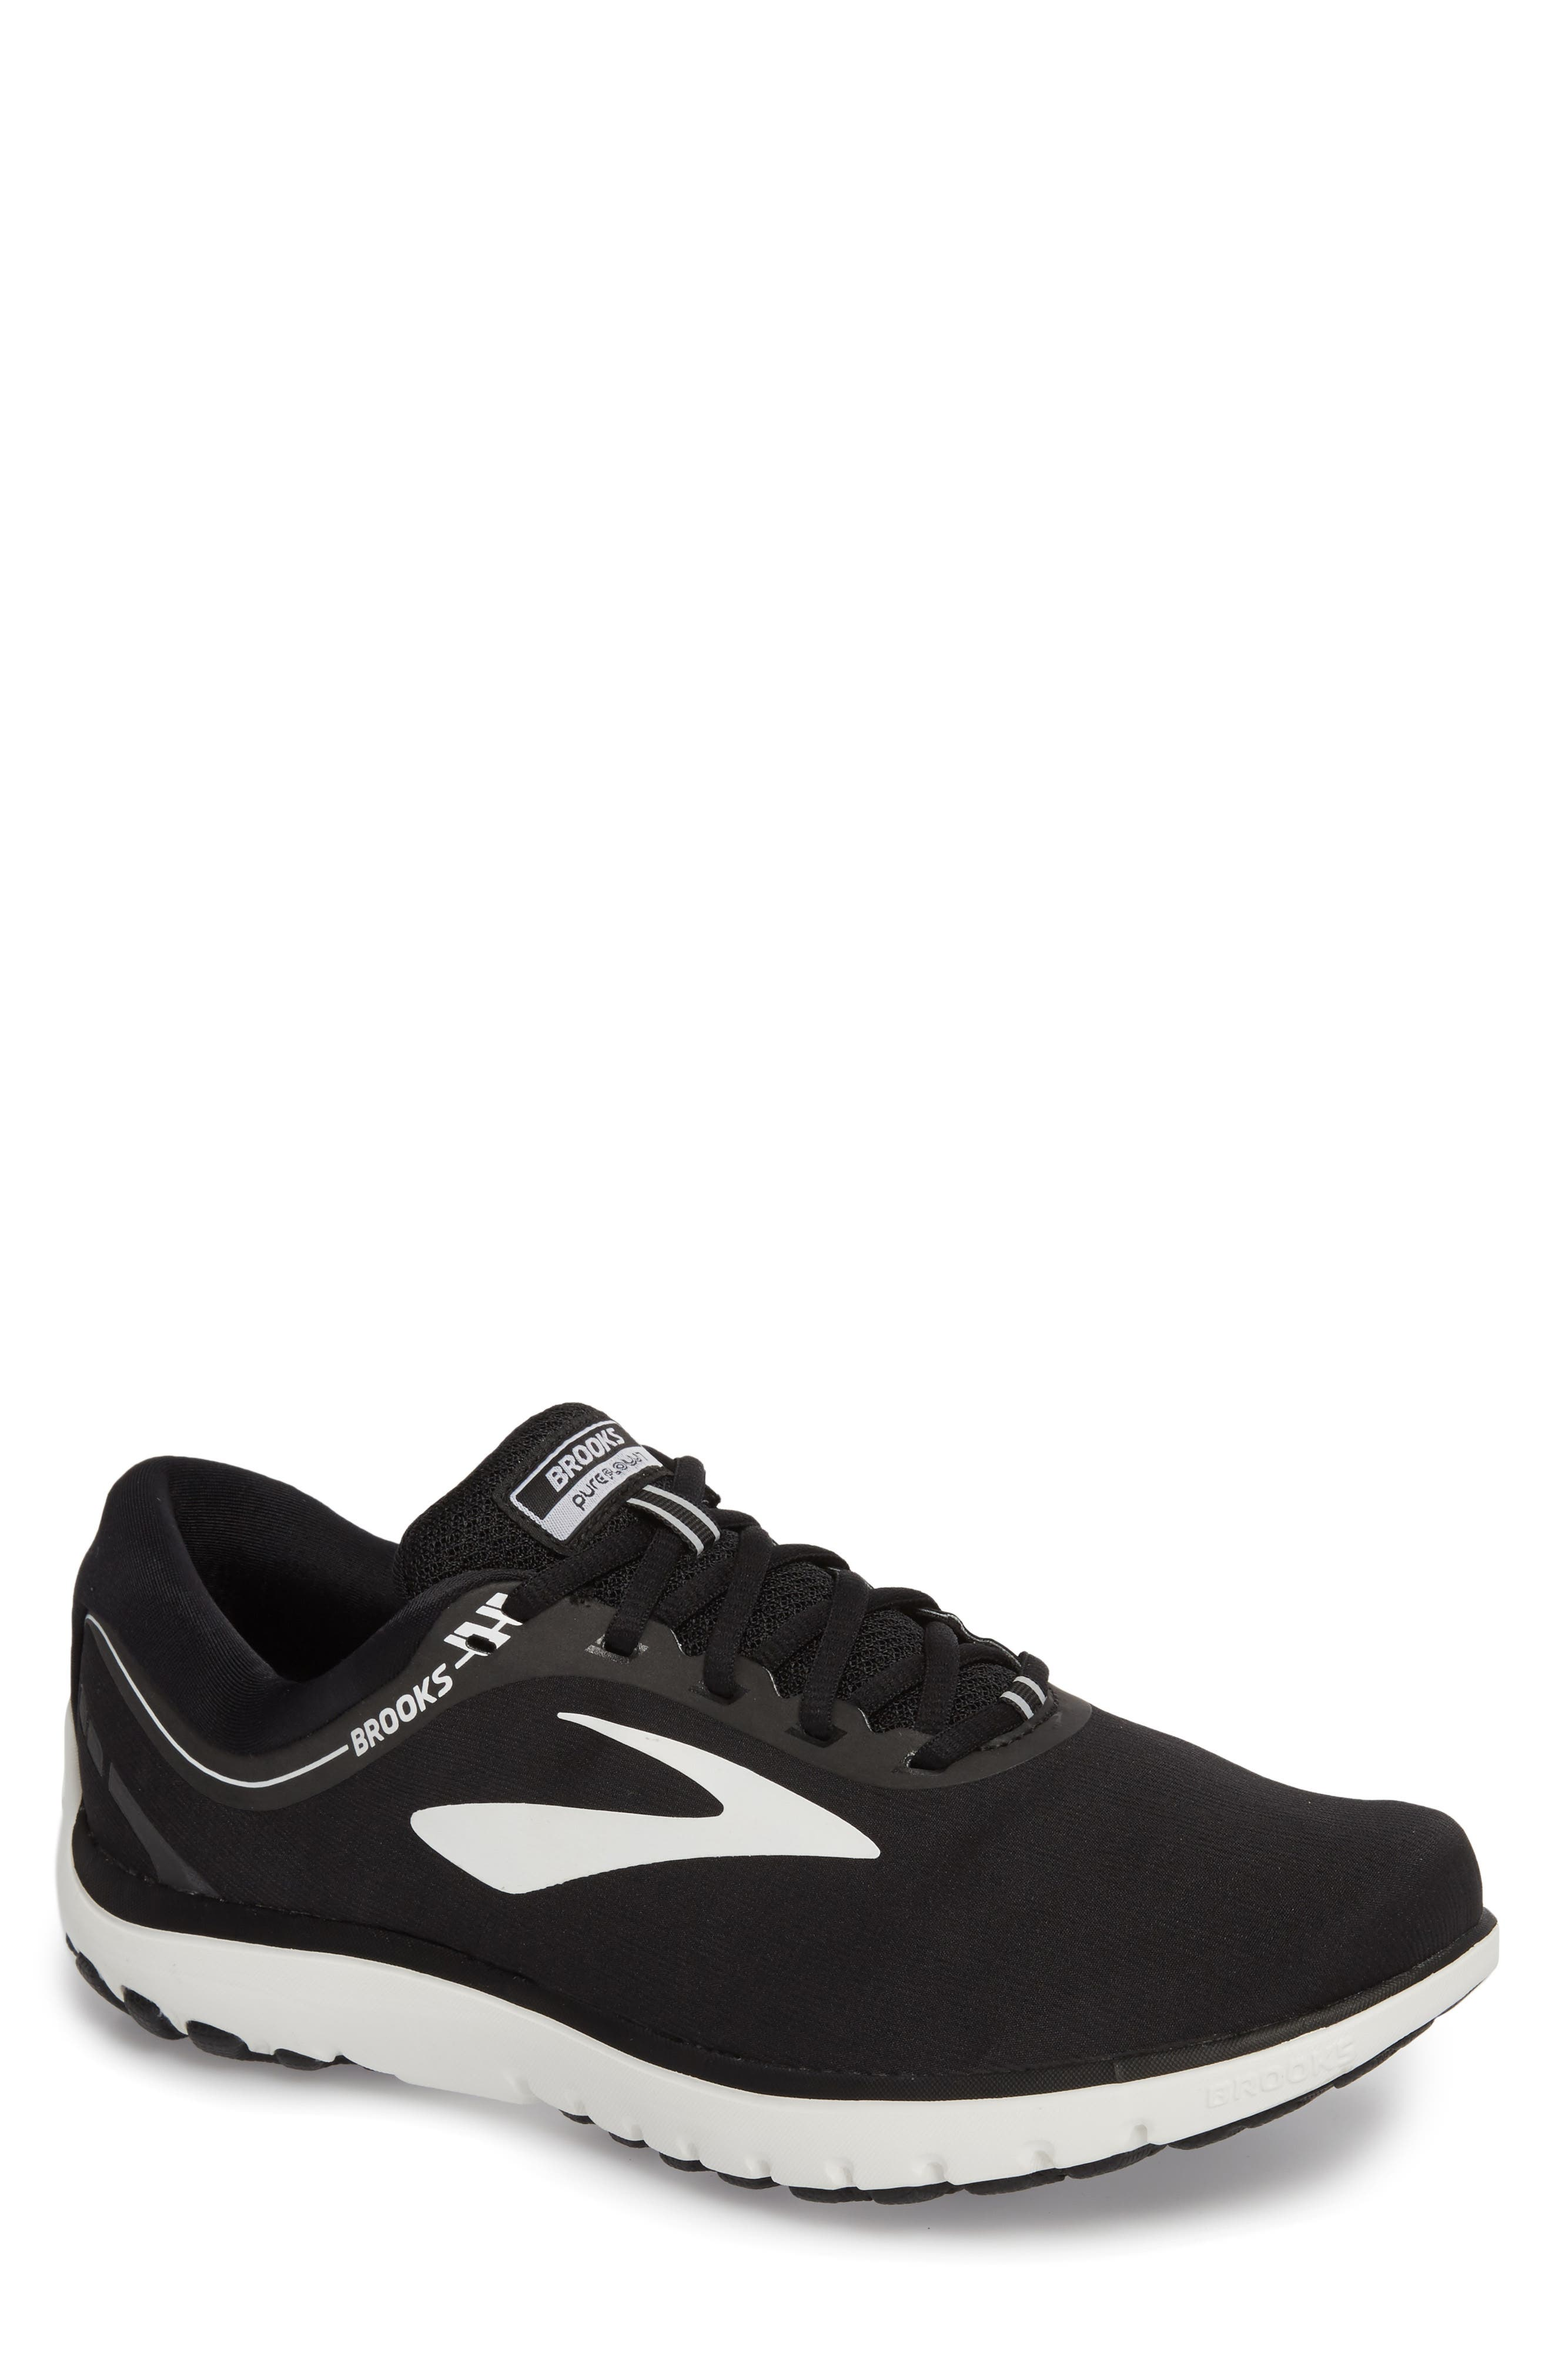 PureFlow 7 Running Shoe,                             Main thumbnail 1, color,                             Black/ White